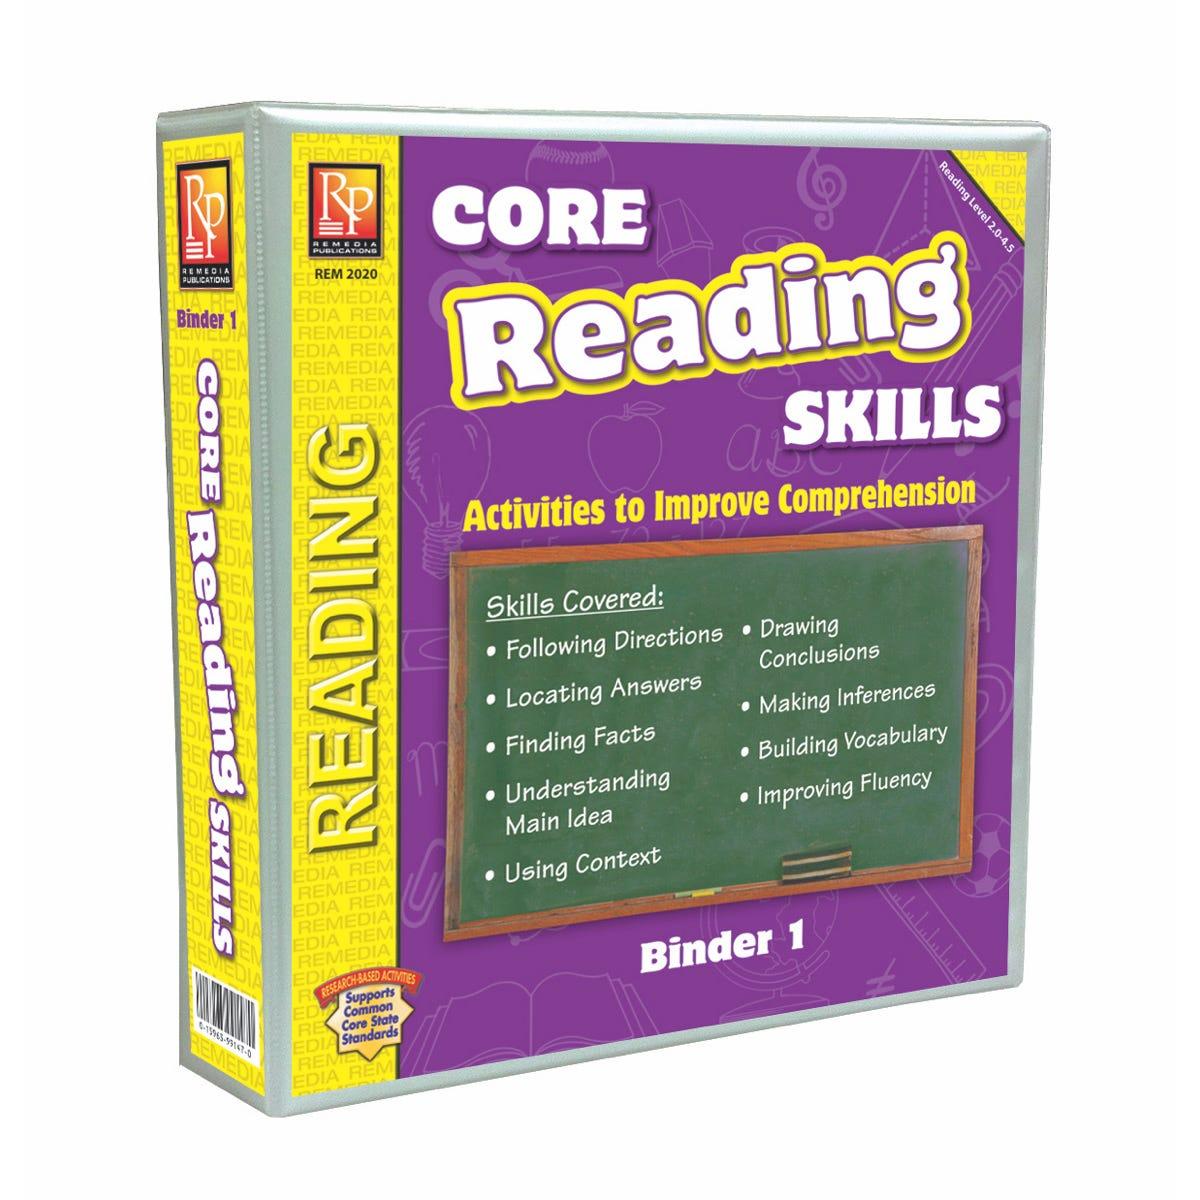 Core Reading Skills Program